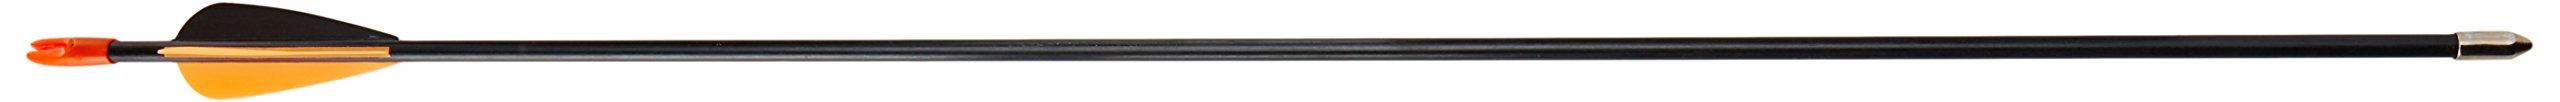 Barnett Crossbows Jr Archery Arrows Bulk (72 Pack)